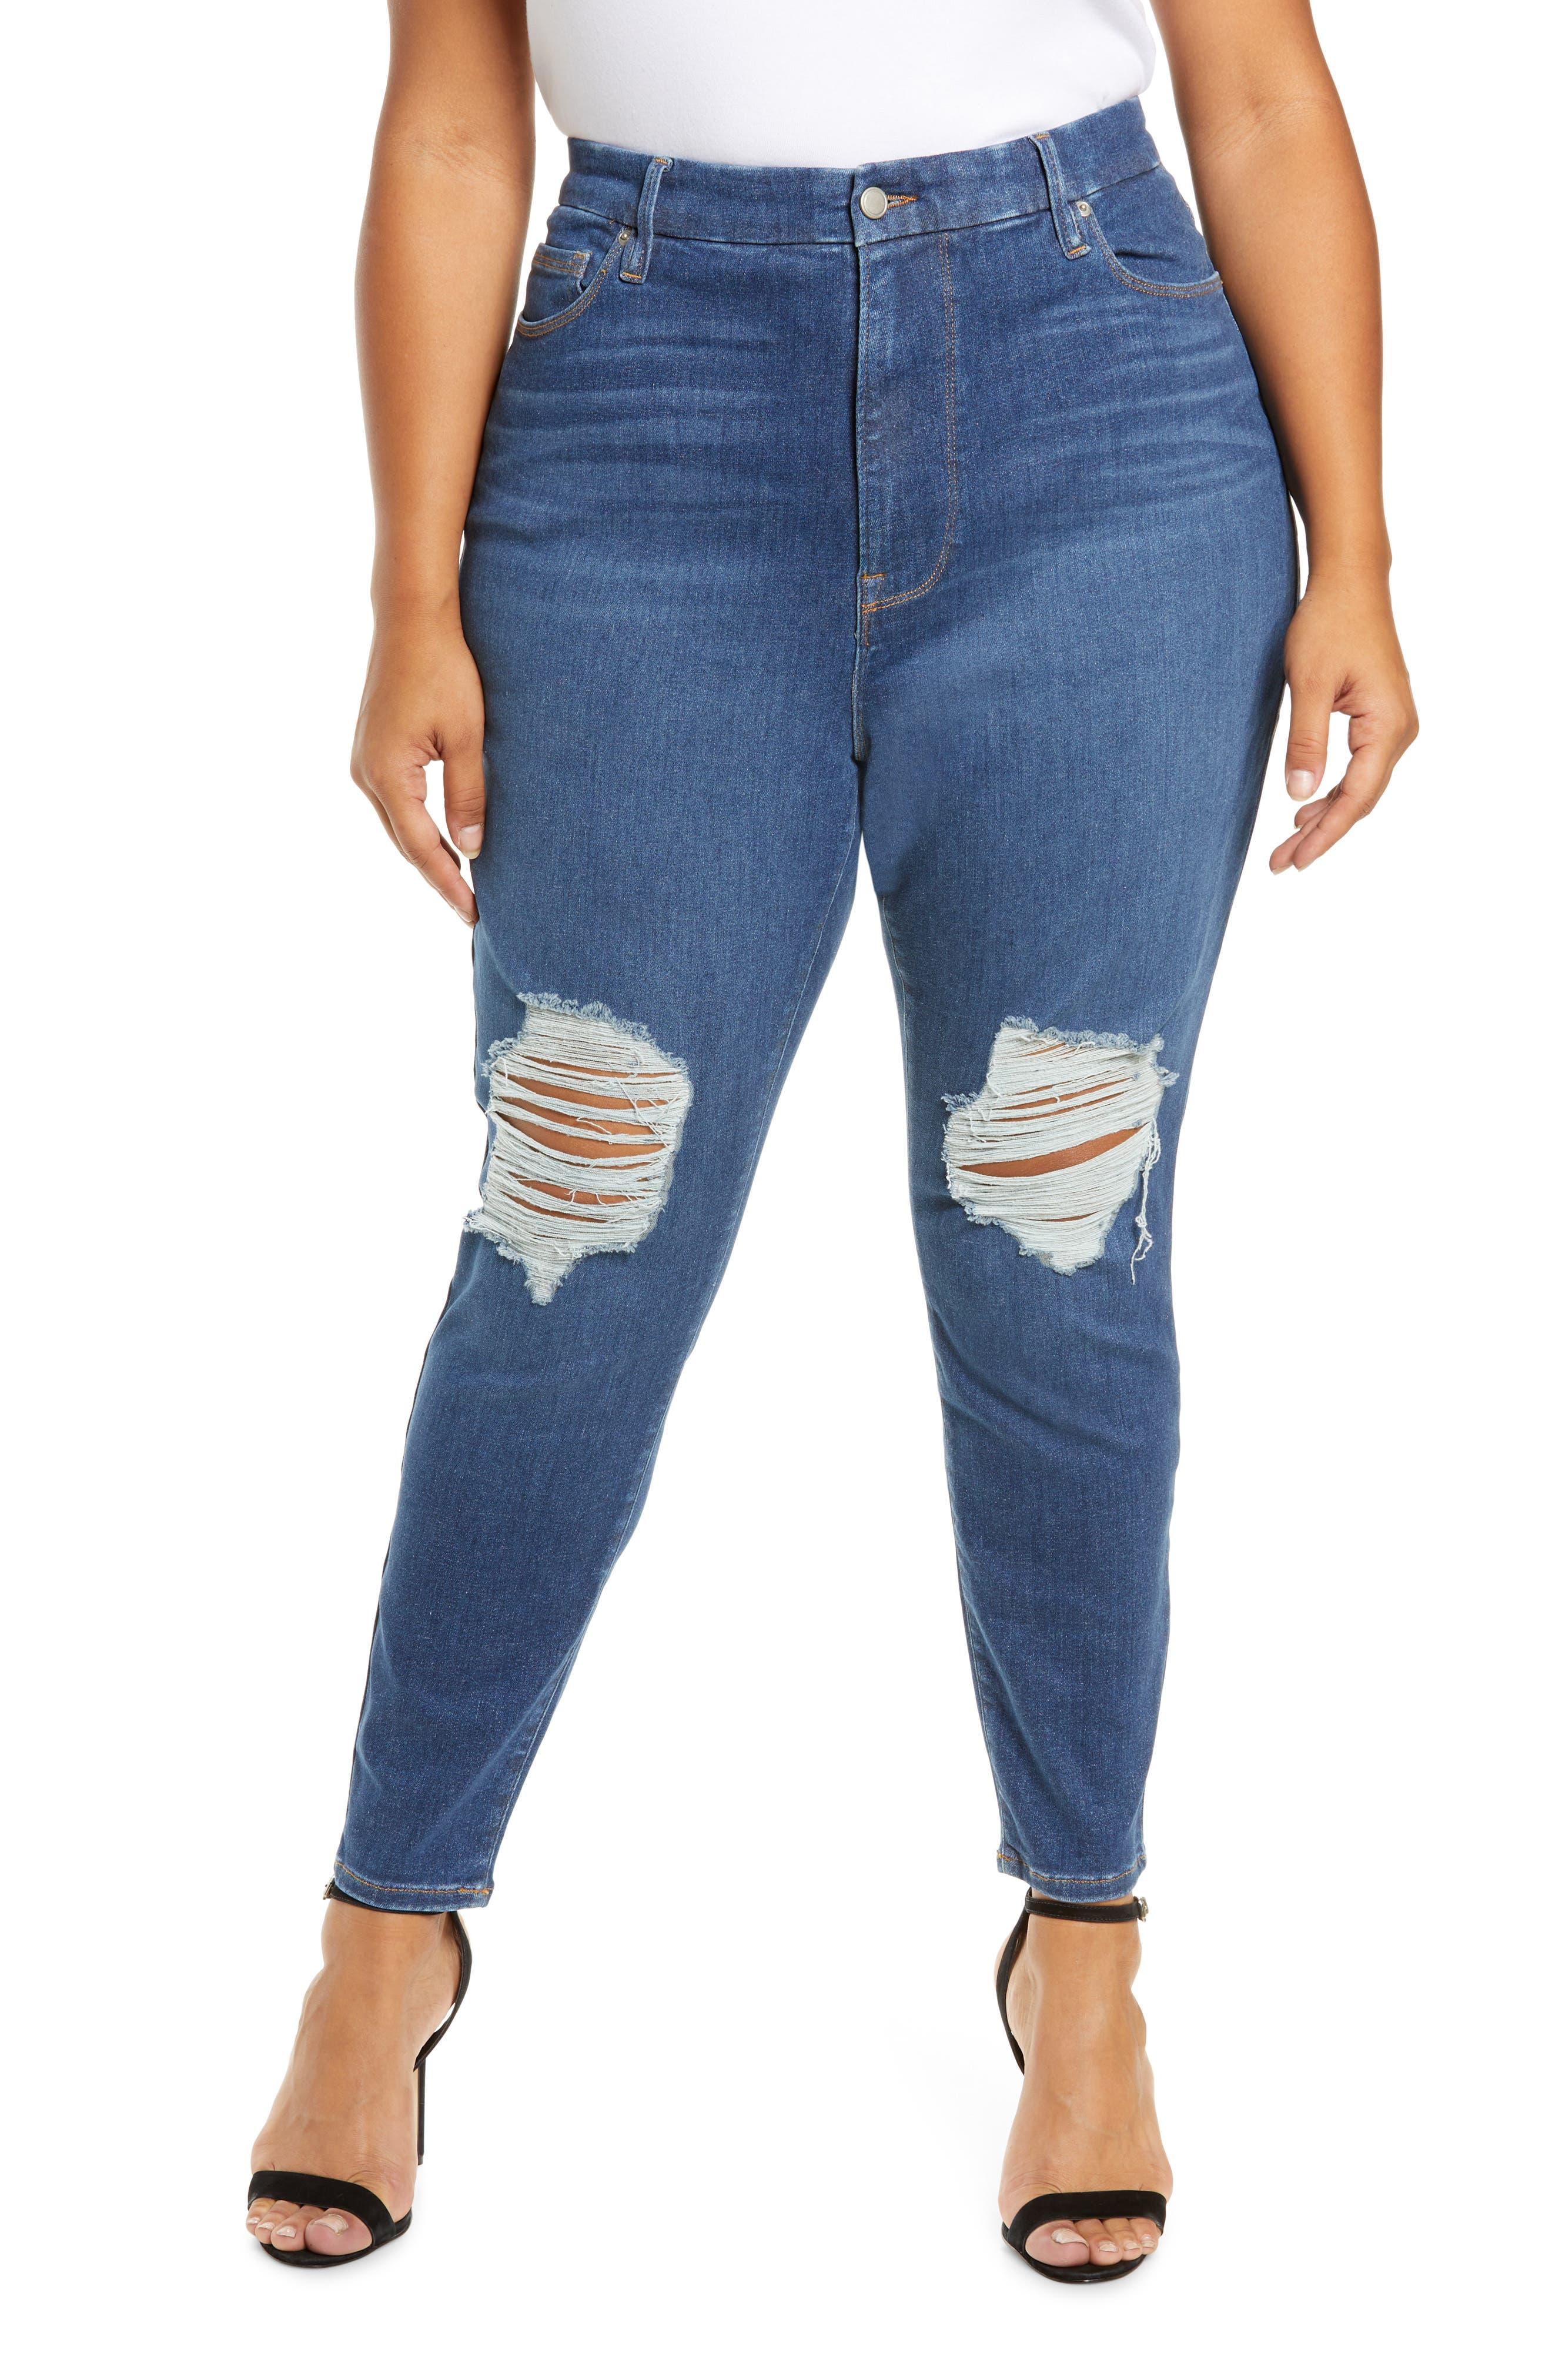 Plus Women's Good American Always Fits Ankle Skinny Jeans